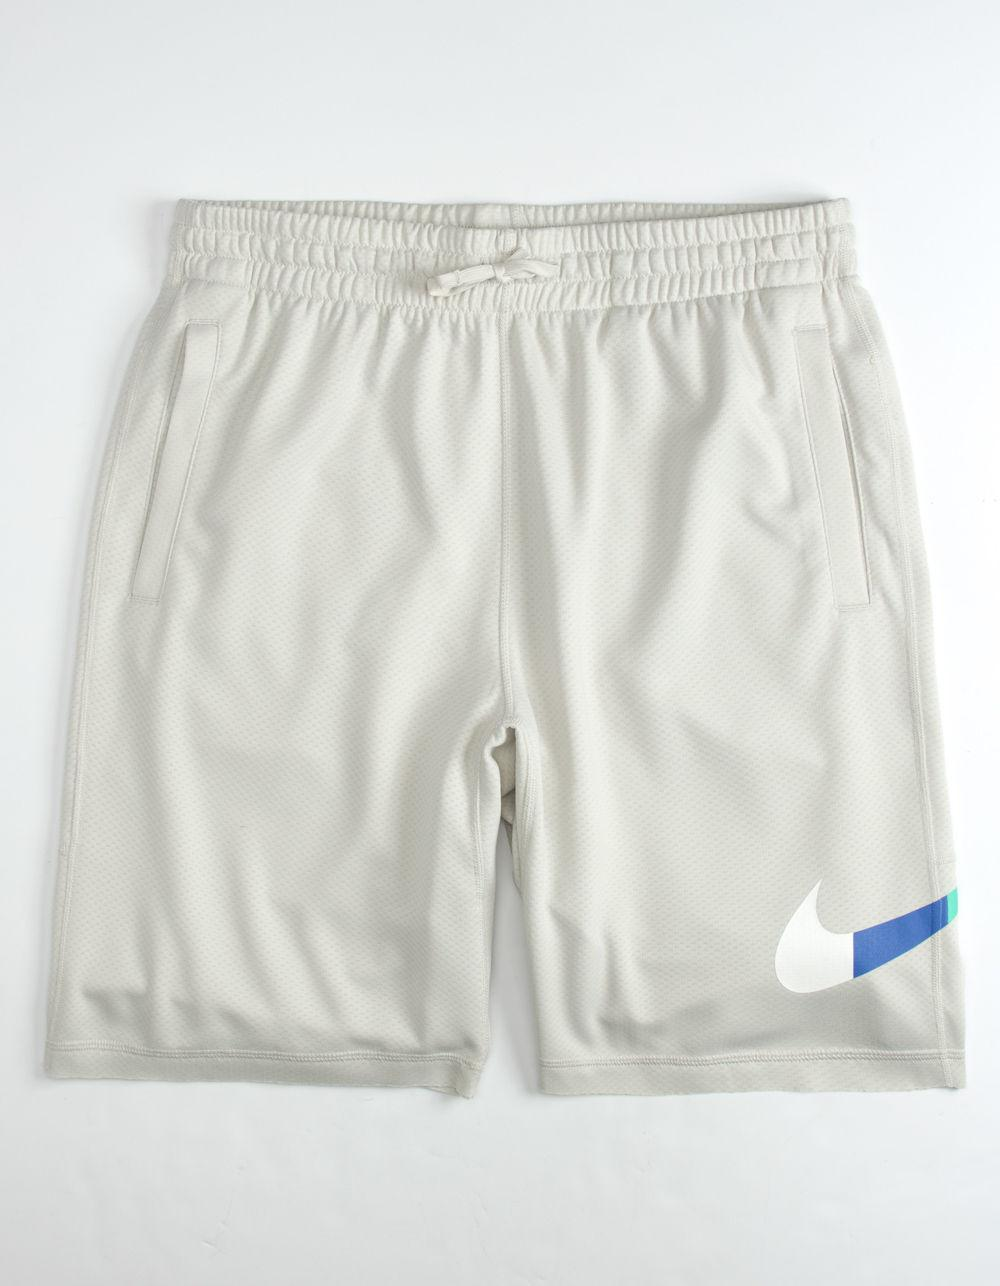 93986b551cb1 Lyst - Nike Dri-fit Sunday Bone Mens Sweat Shorts in White for Men